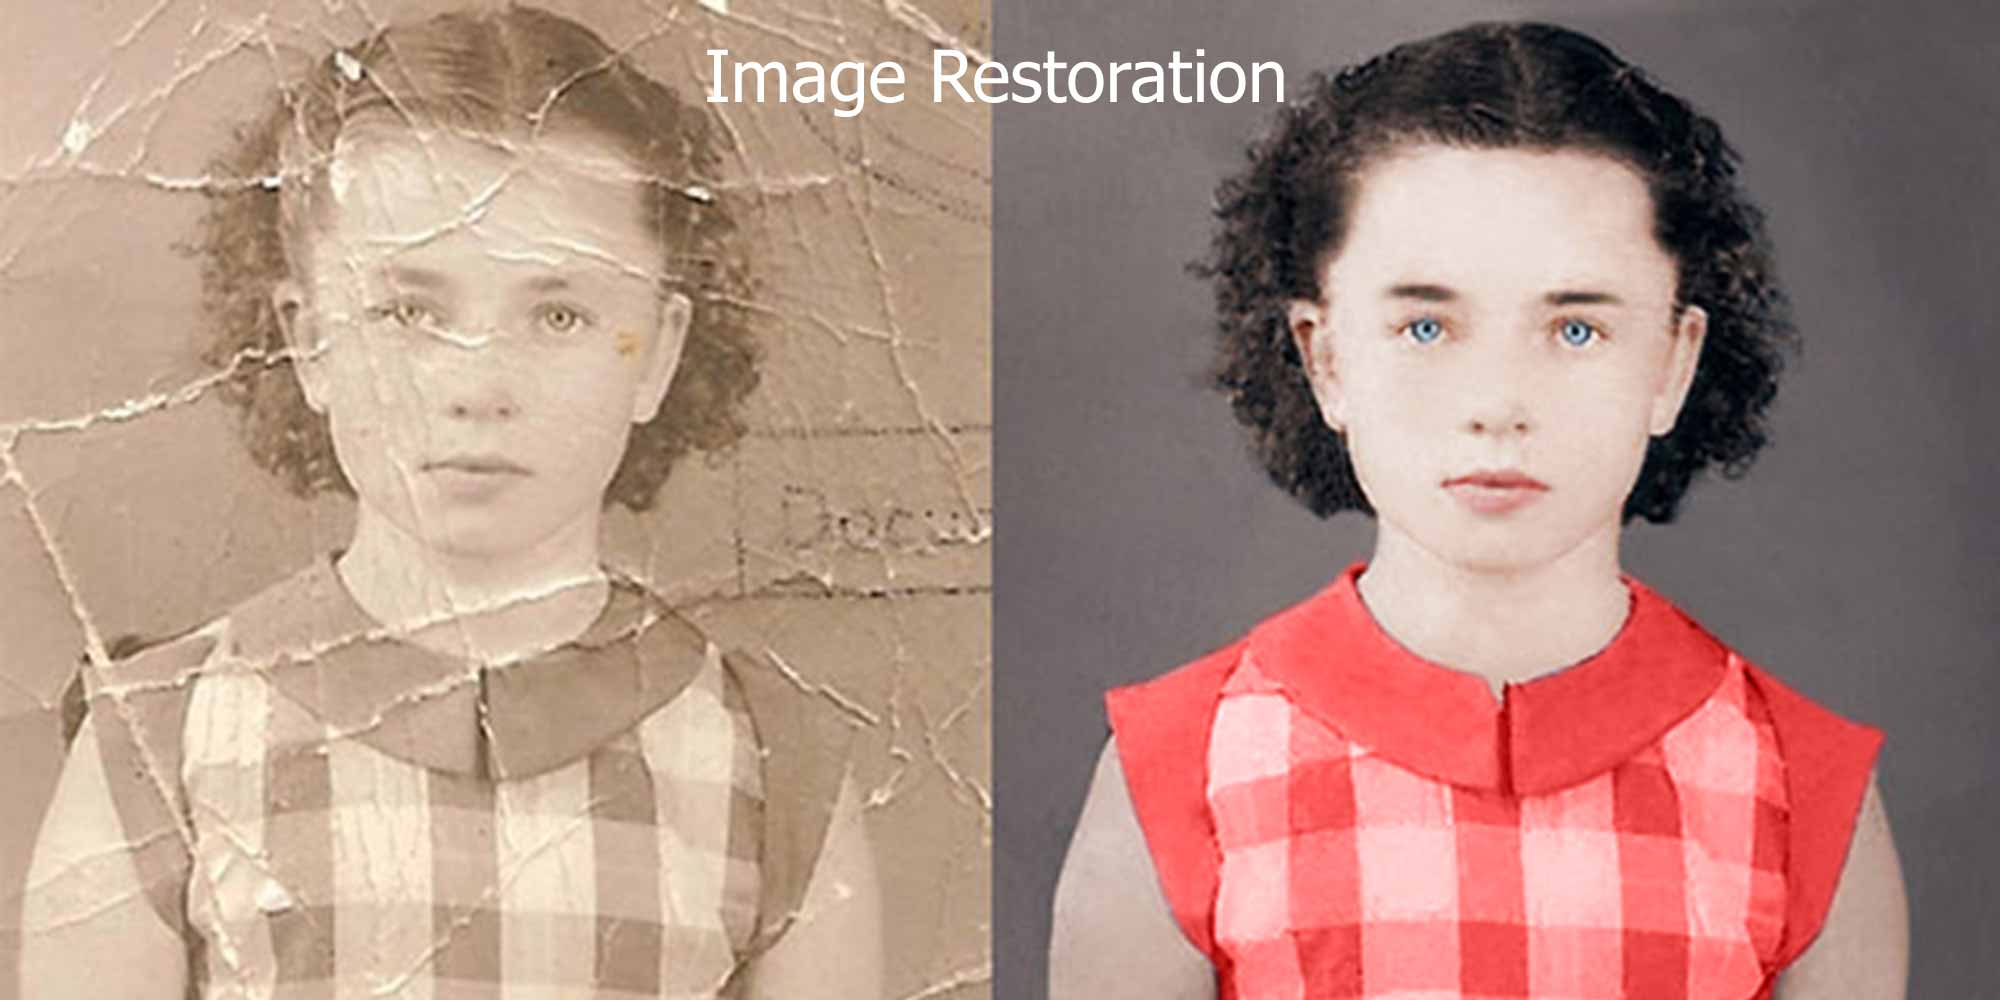 image-restoration